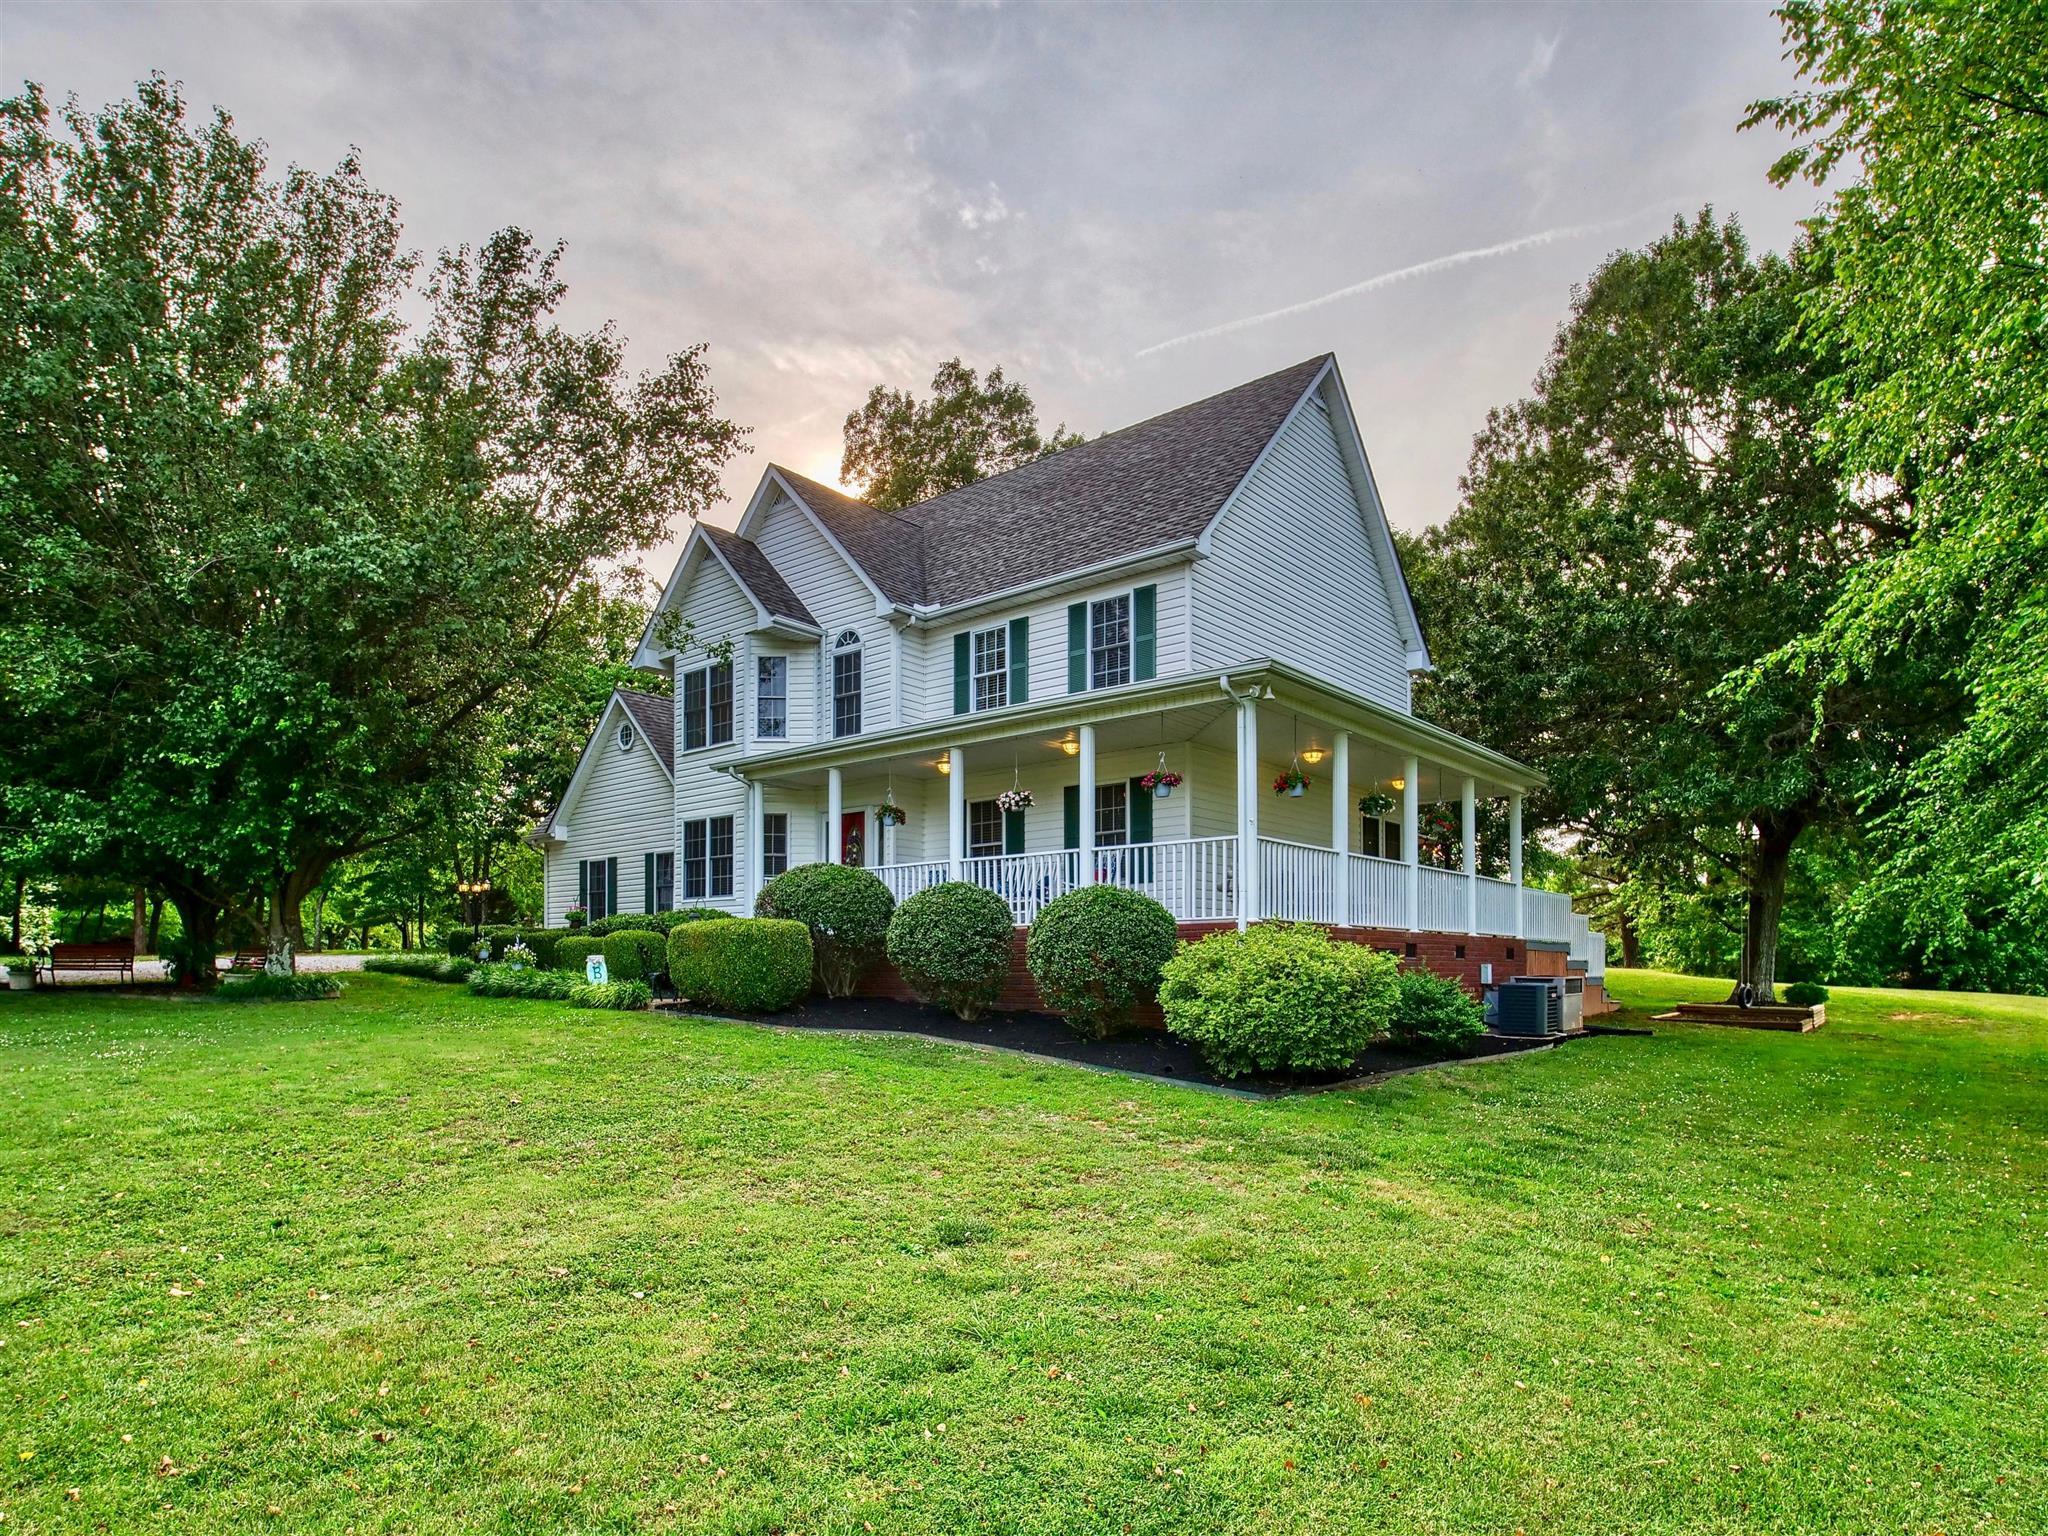 116 Parkers Chapel Road Old, Portland, TN 37148 - Portland, TN real estate listing